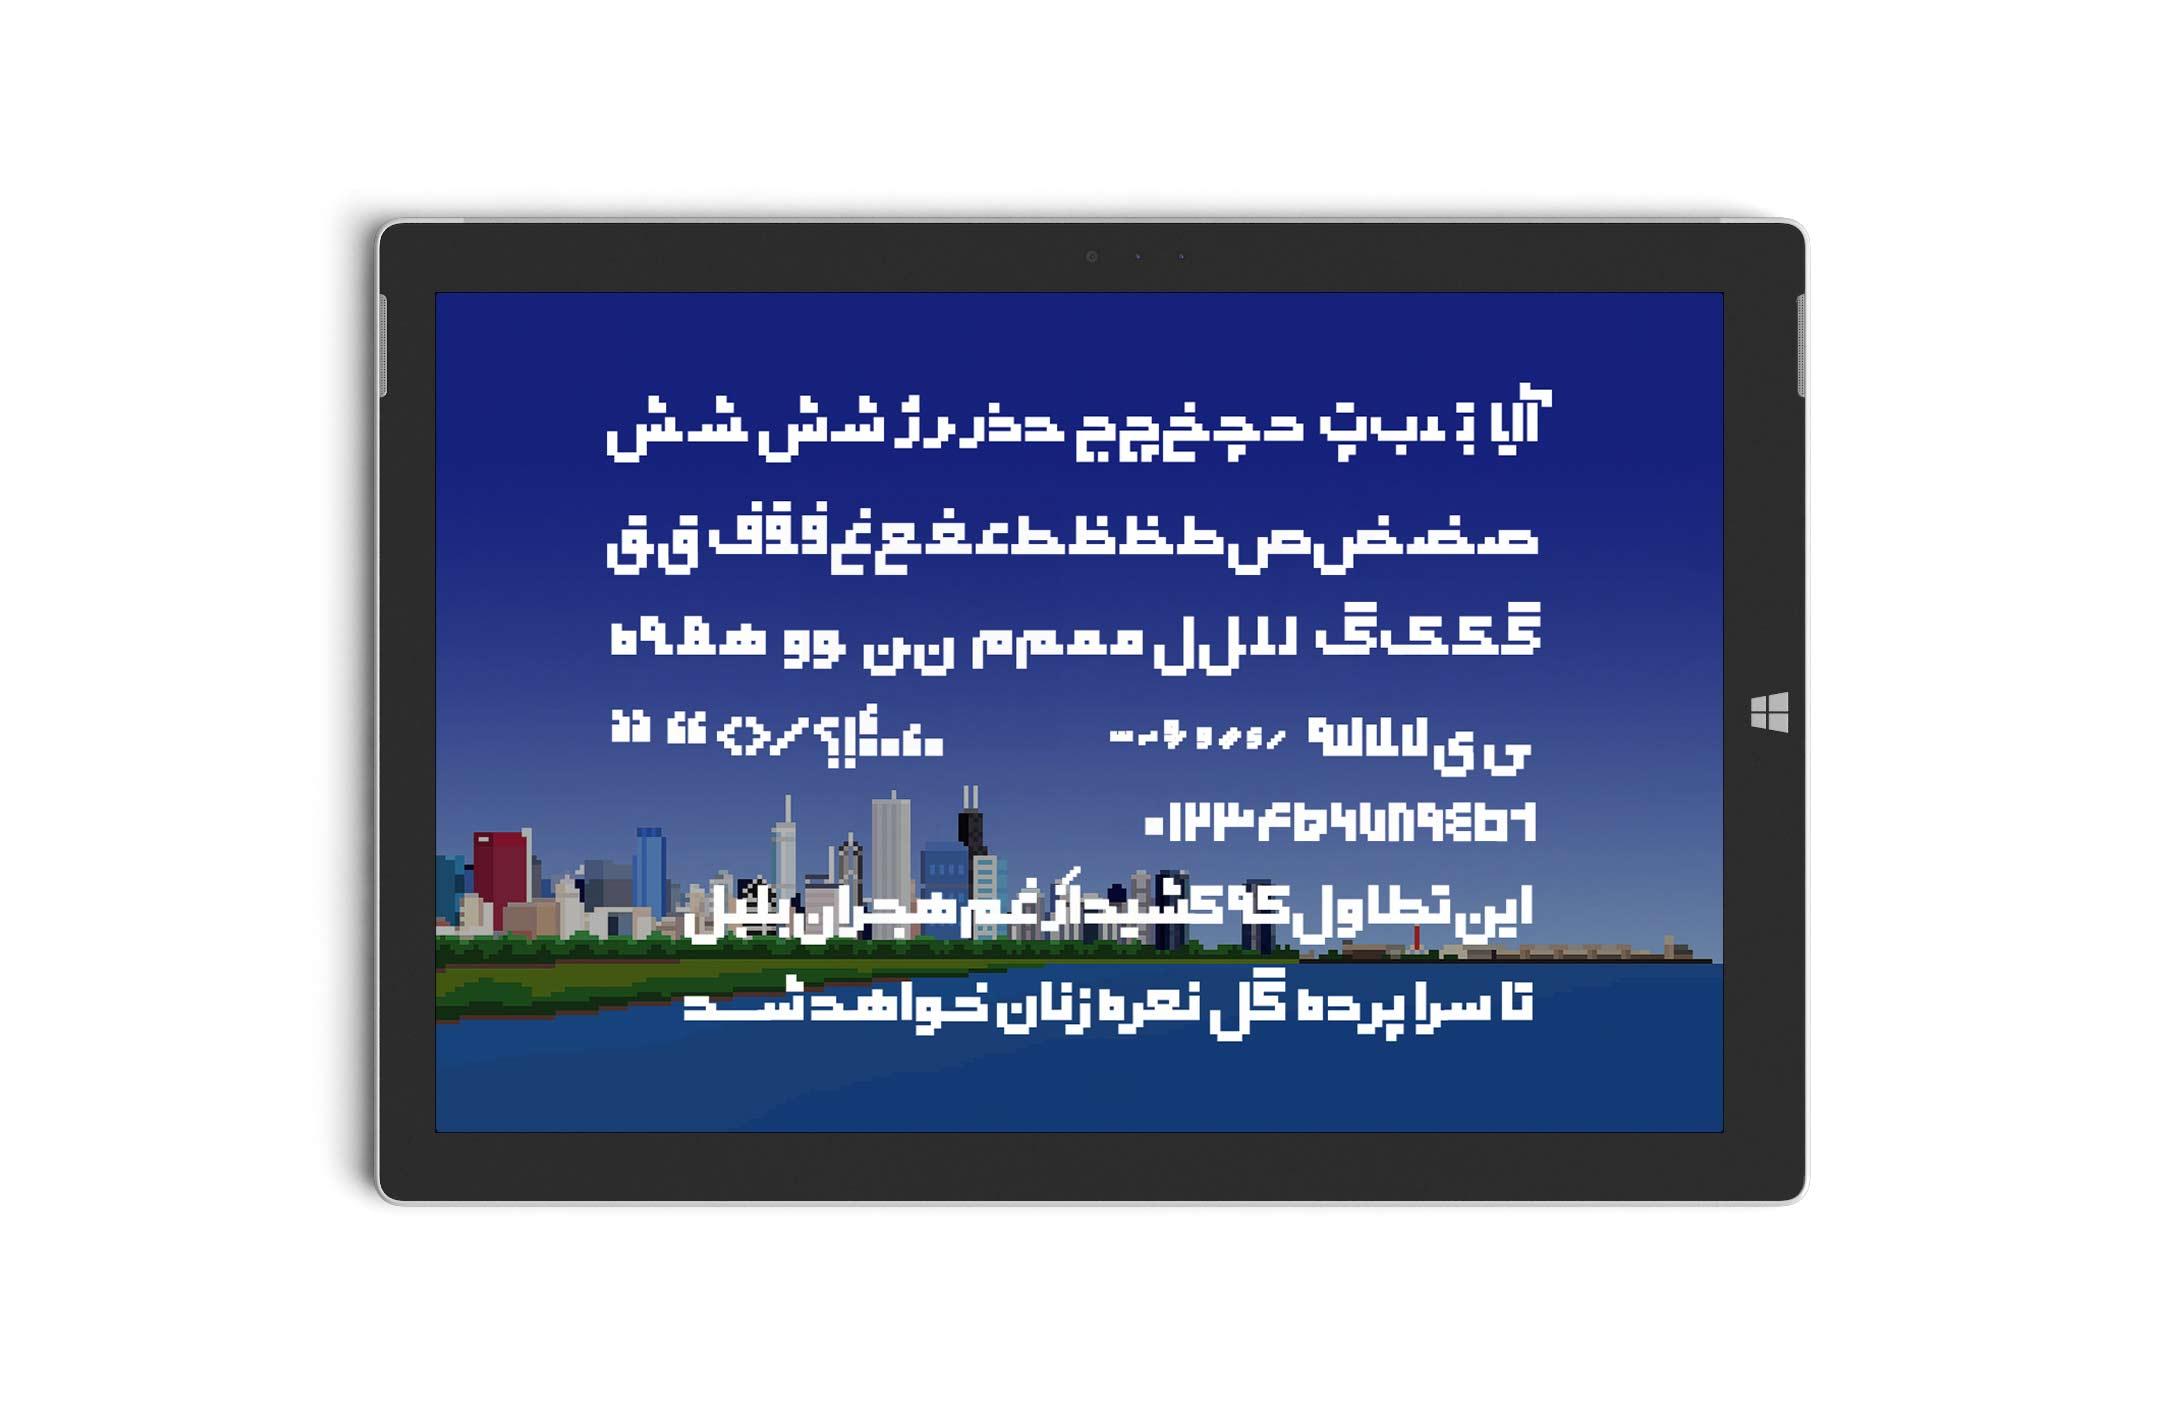 8bit-font-pixeler-3